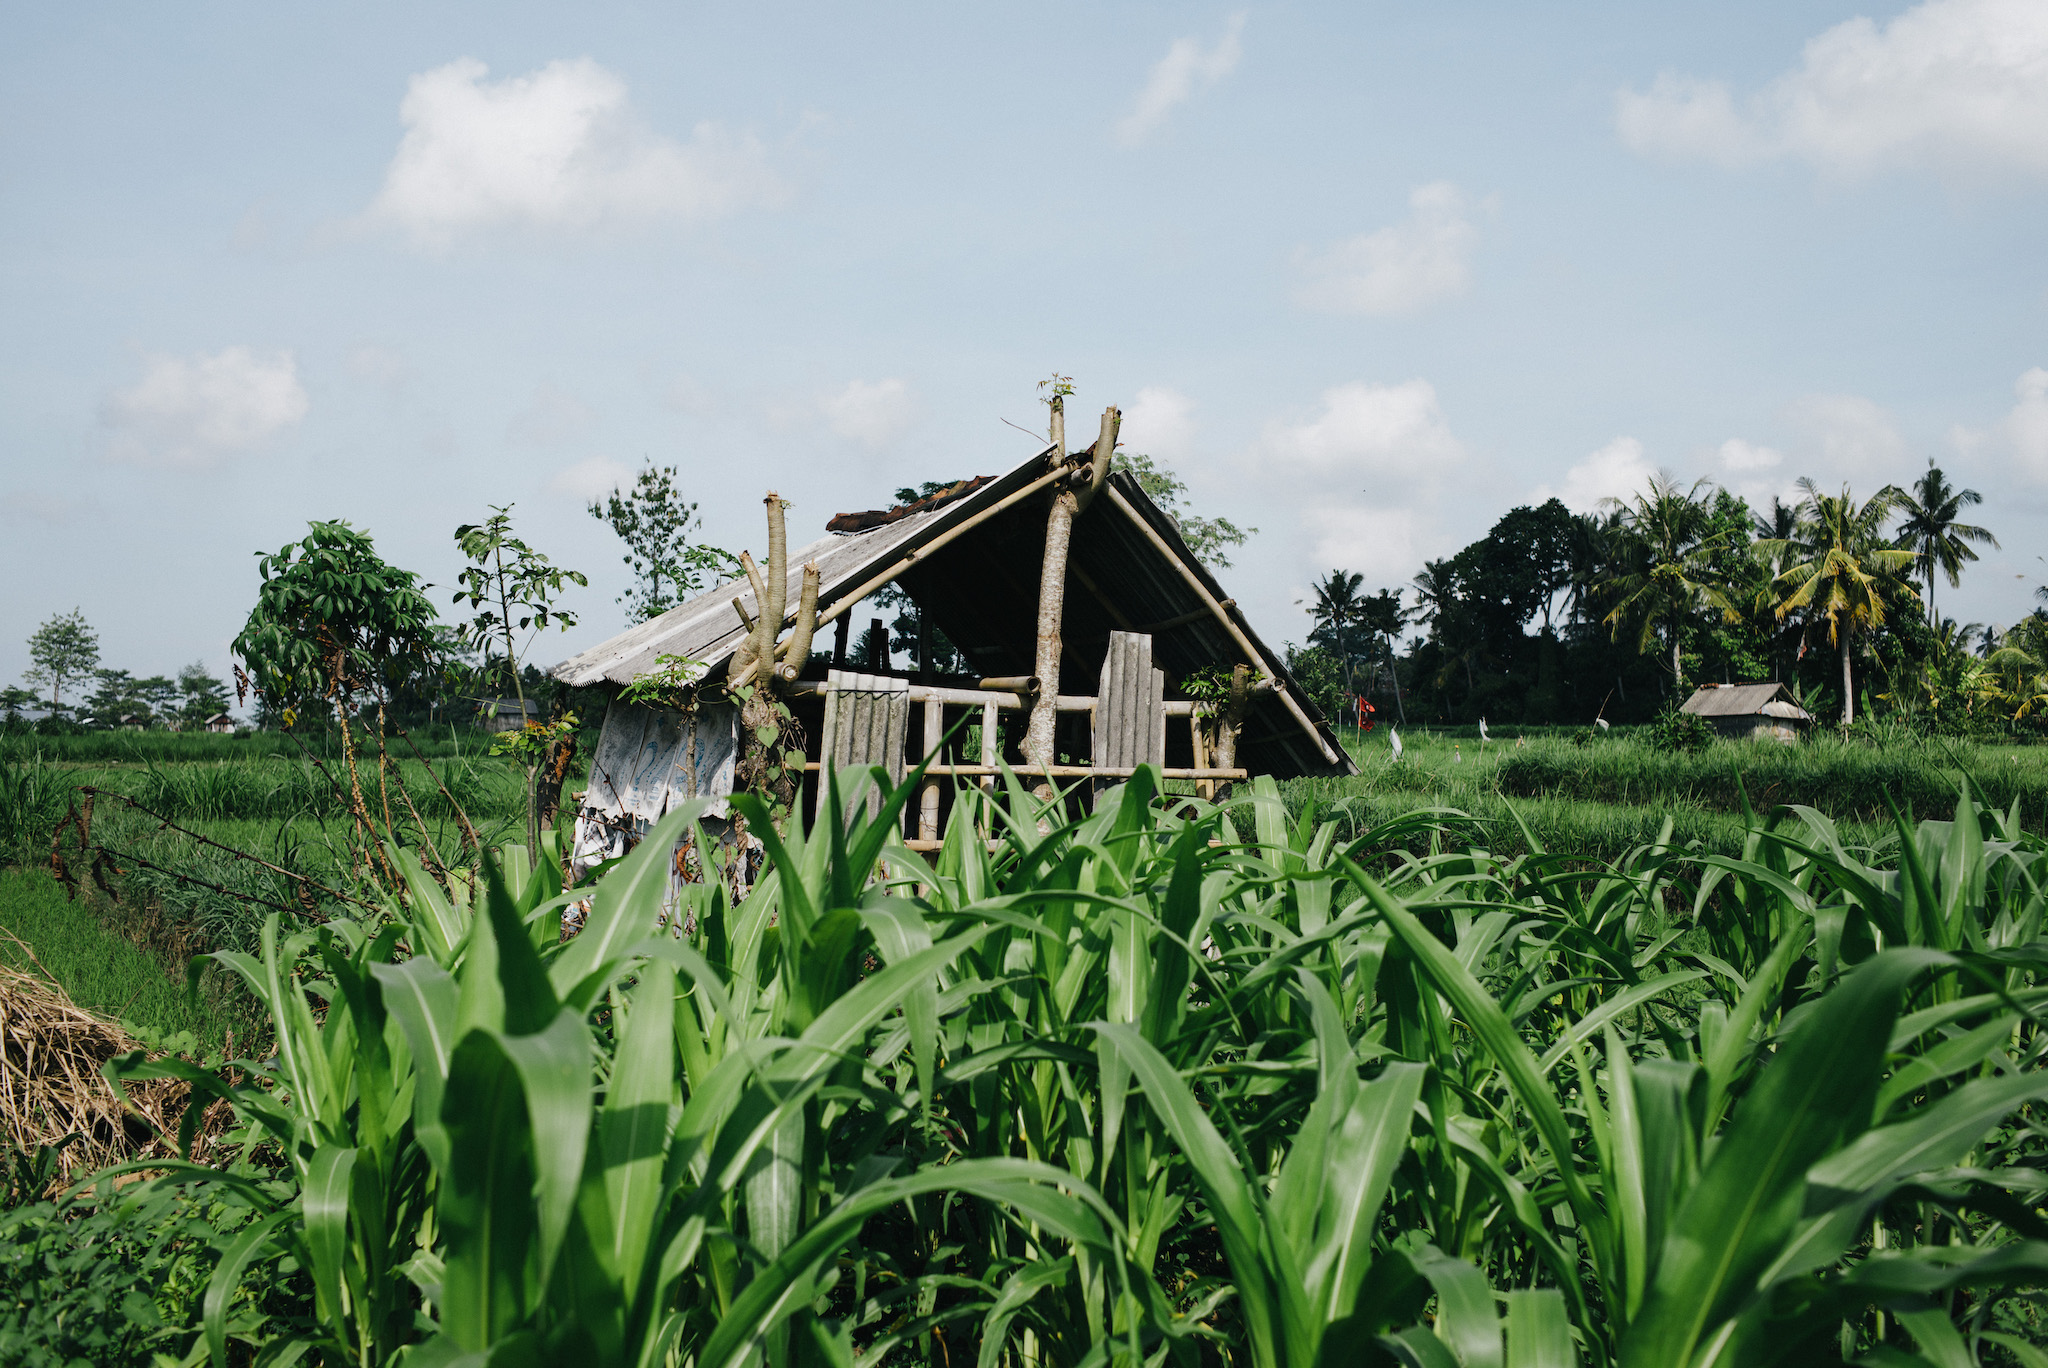 Rice and vegetable fields in Sidemen, Bali. Shot on Leica M Typ 240, Summarit 35mm f/2.5 using VSCO Kodak Portra 160NC processing.